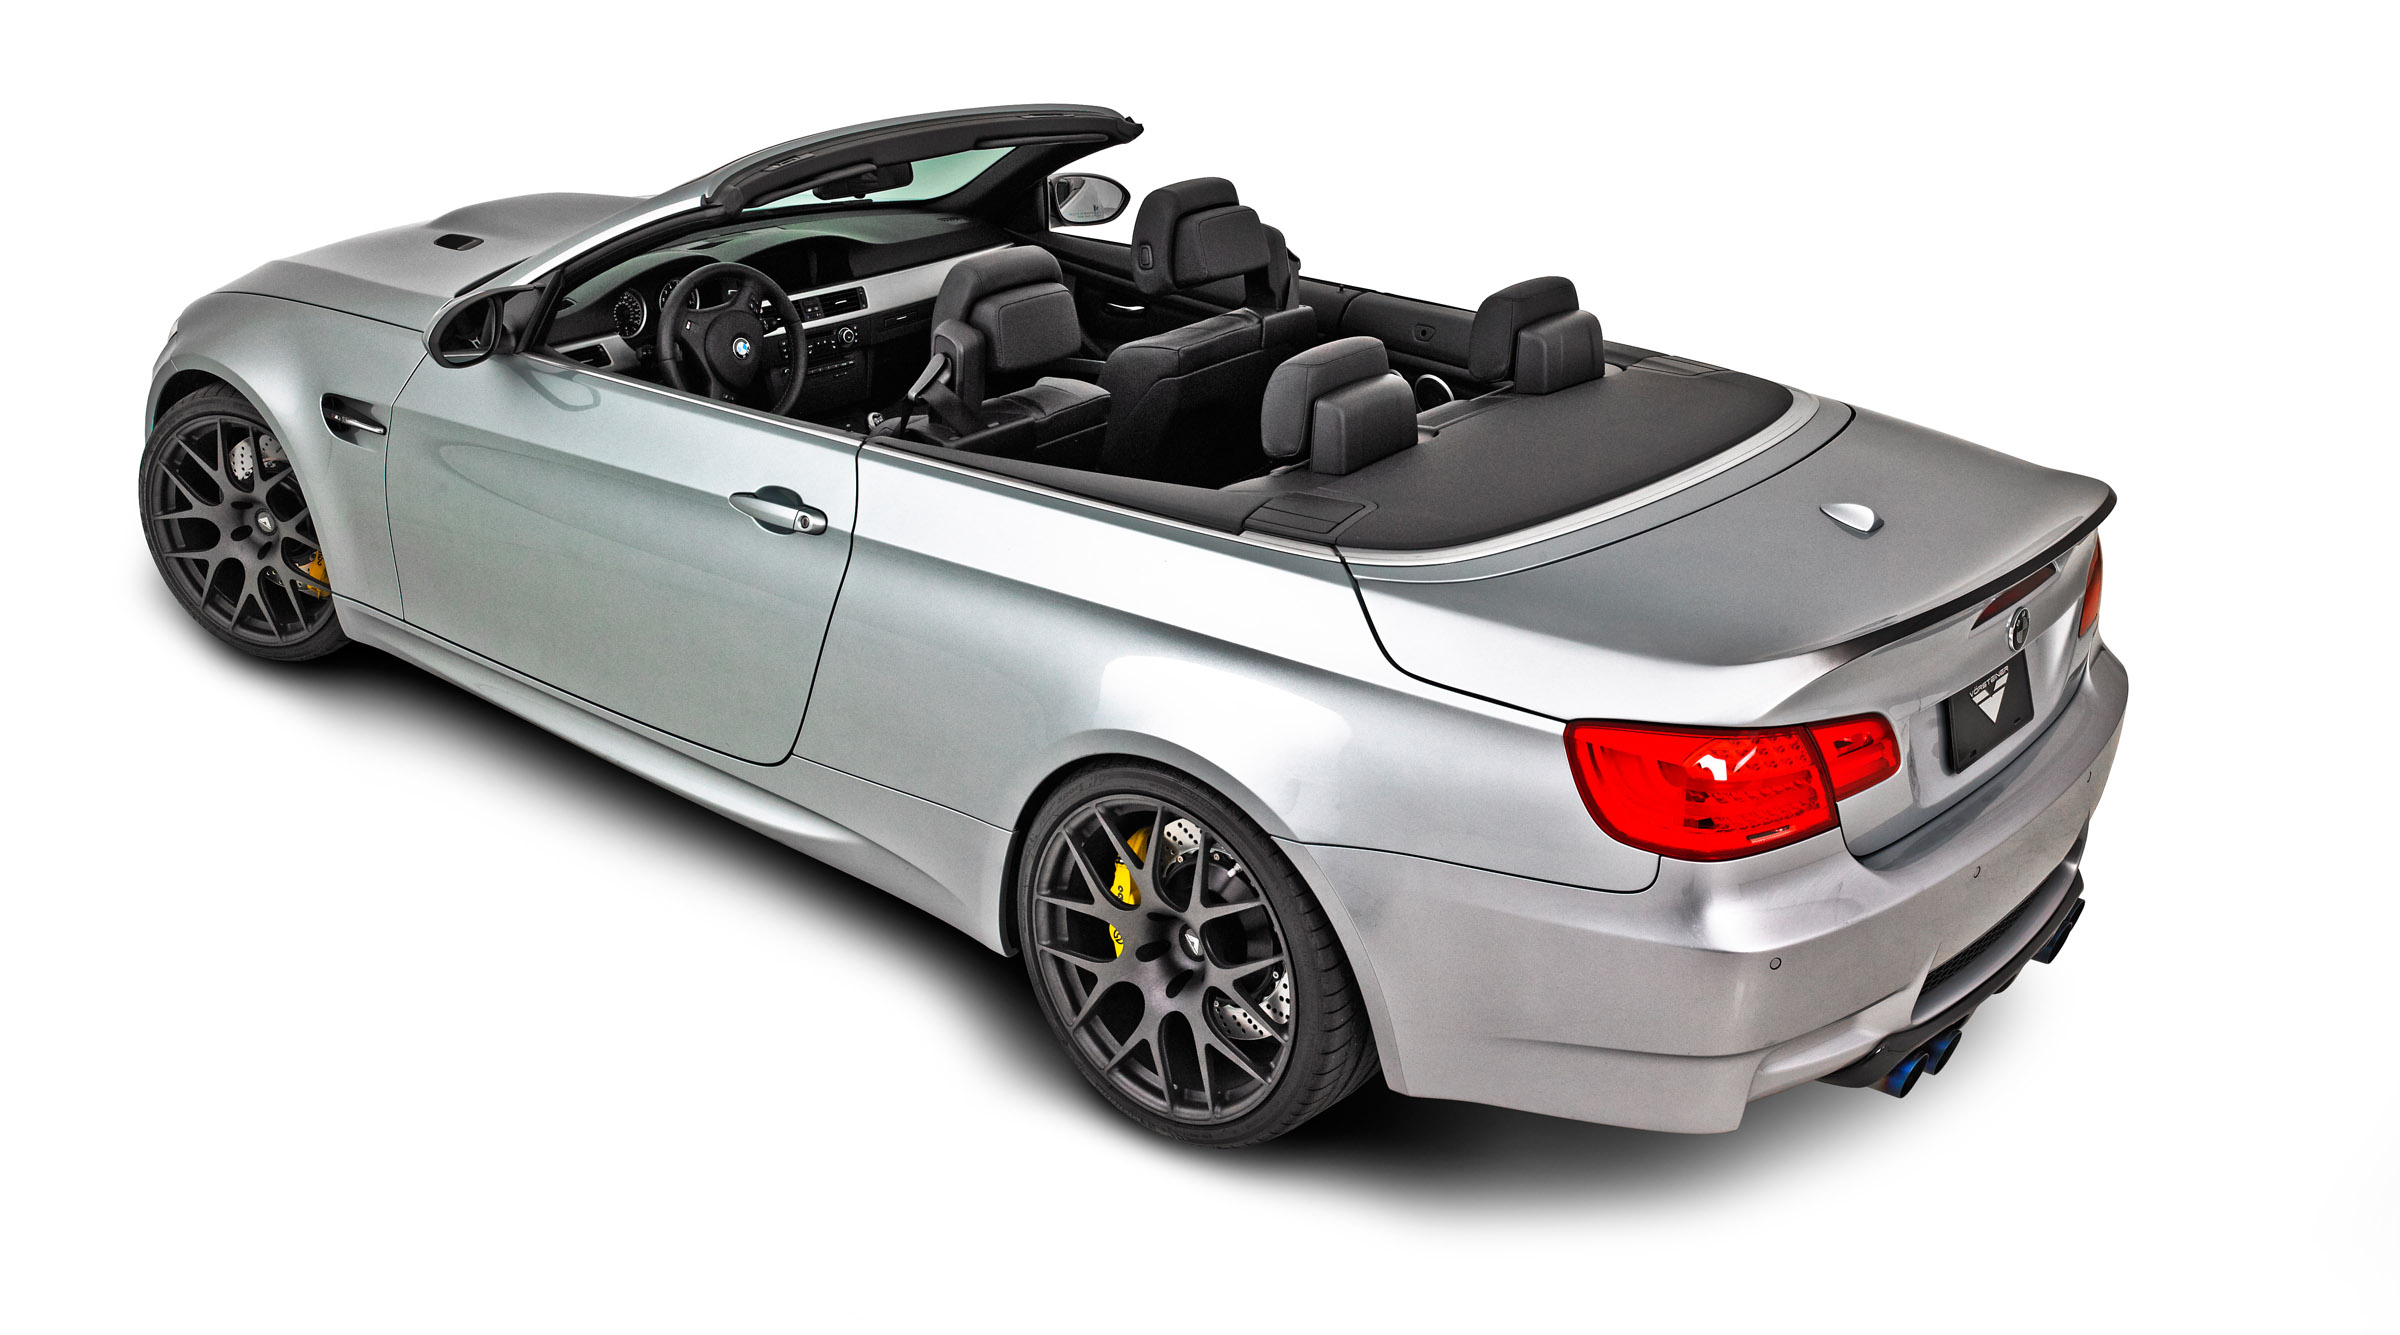 vorsteiner bmw e93 m3 cabrio. Black Bedroom Furniture Sets. Home Design Ideas